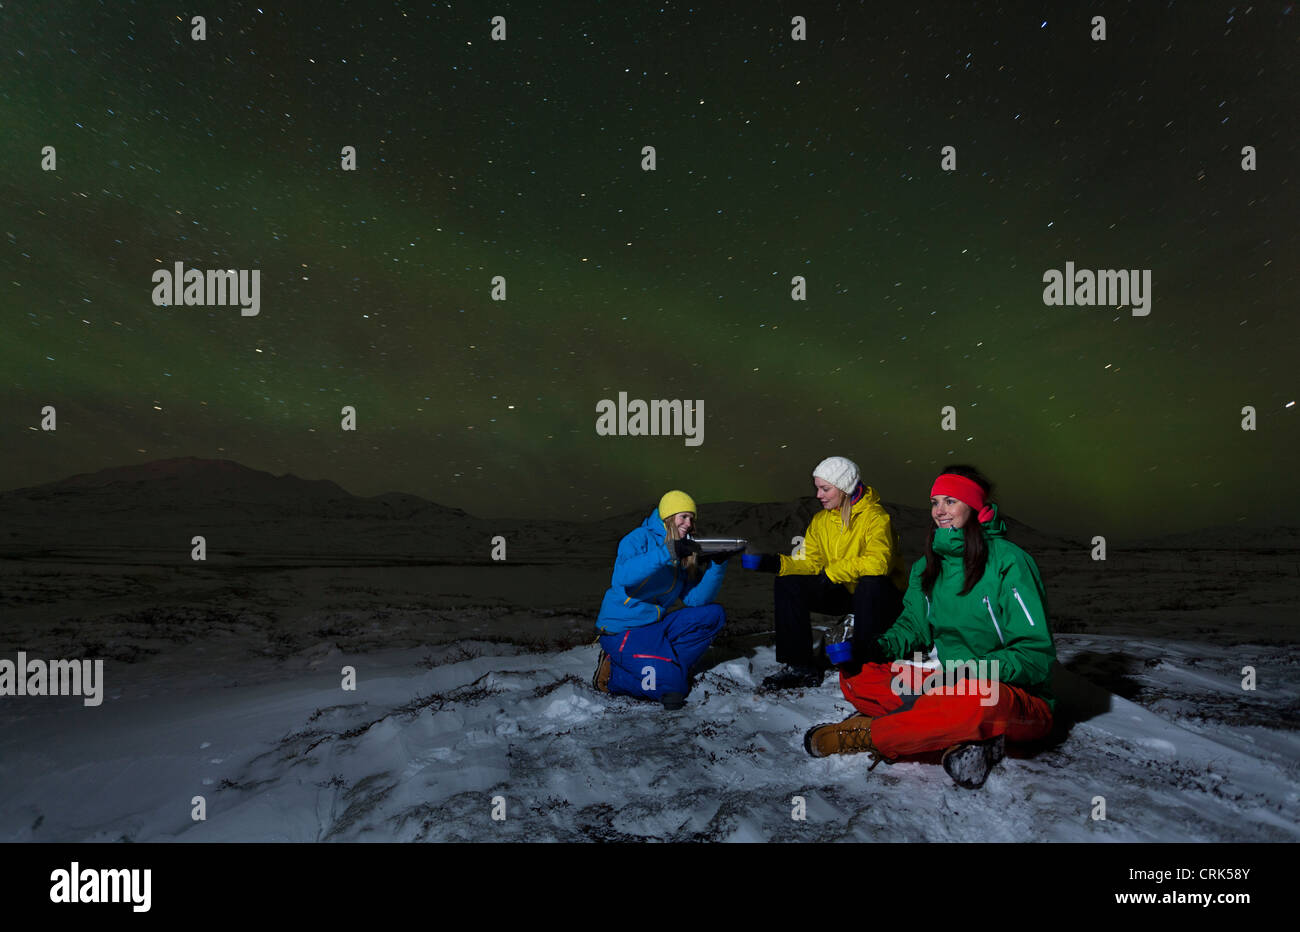 Hikers relaxing under aurora borealis - Stock Image